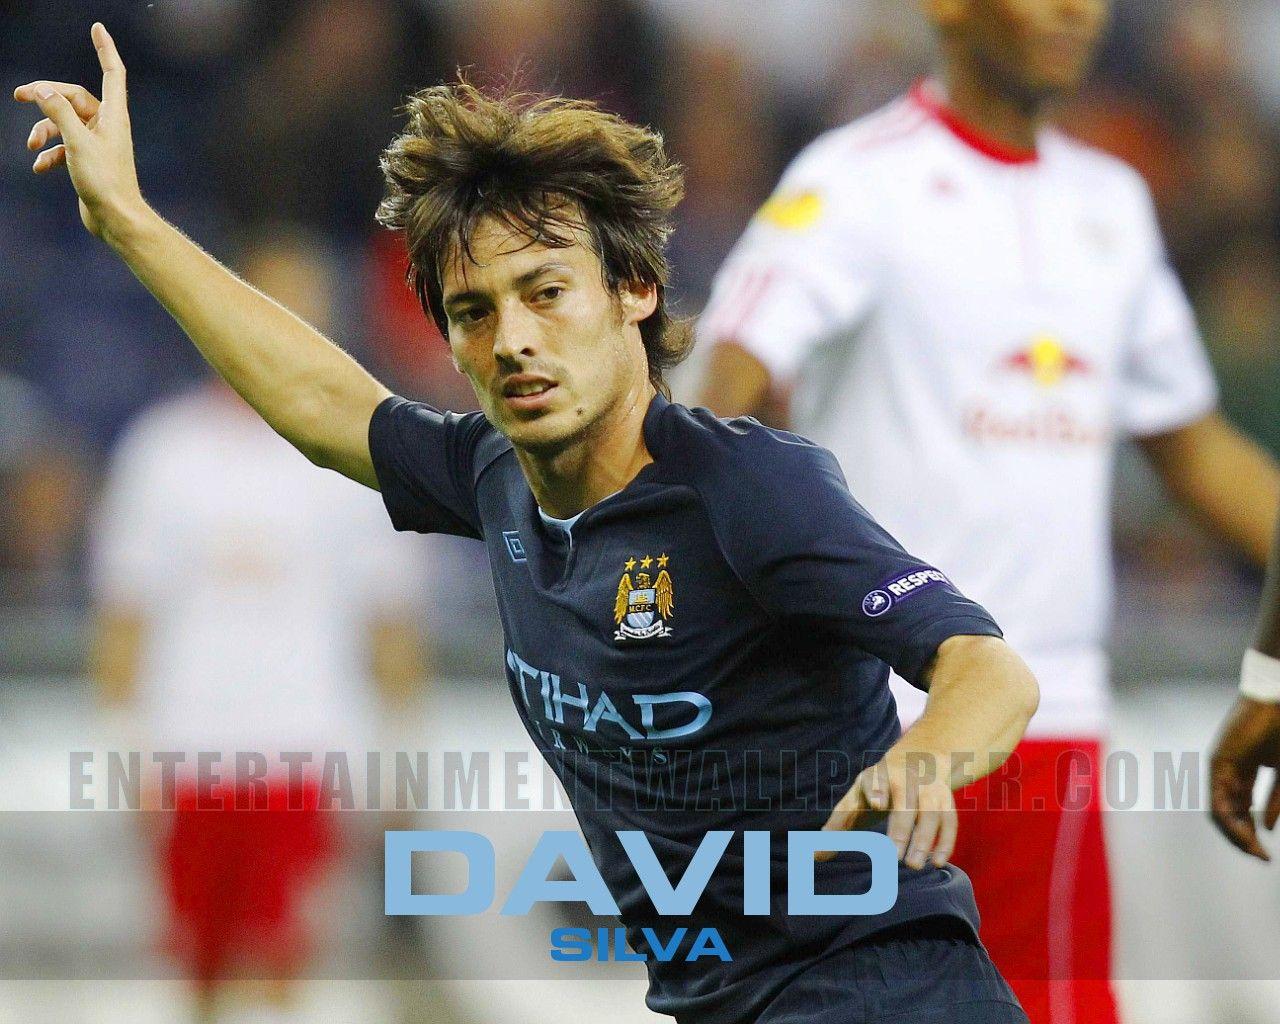 David Silva Goal Celebration Photo Picture Image